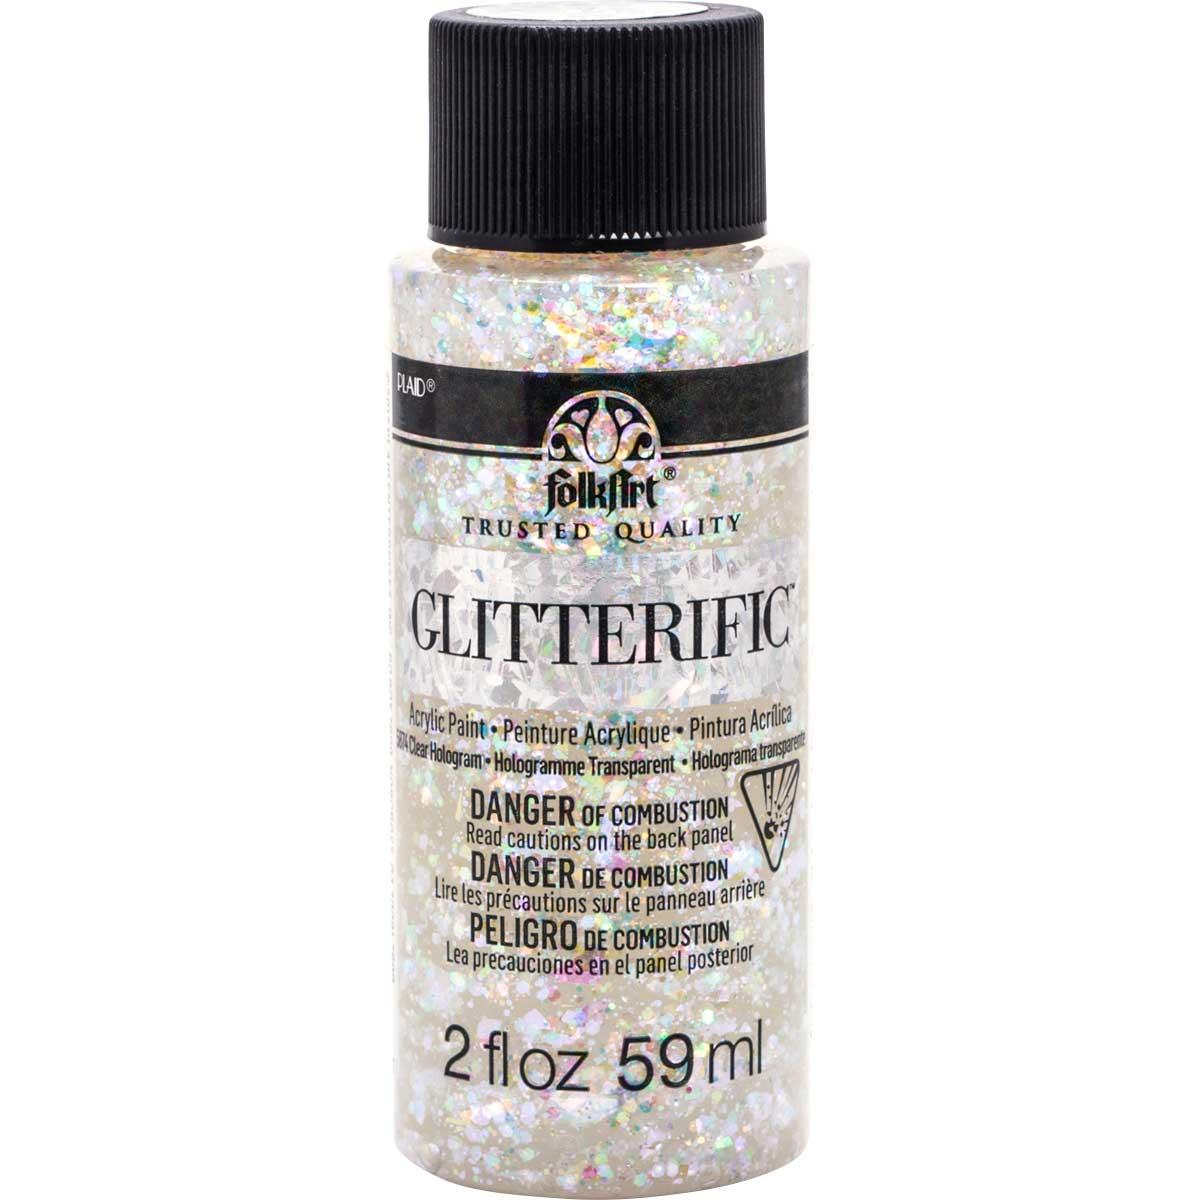 FolkArt ® Glitterific™ Acrylic Paint - Clear Hologram, 2 oz. - 5874